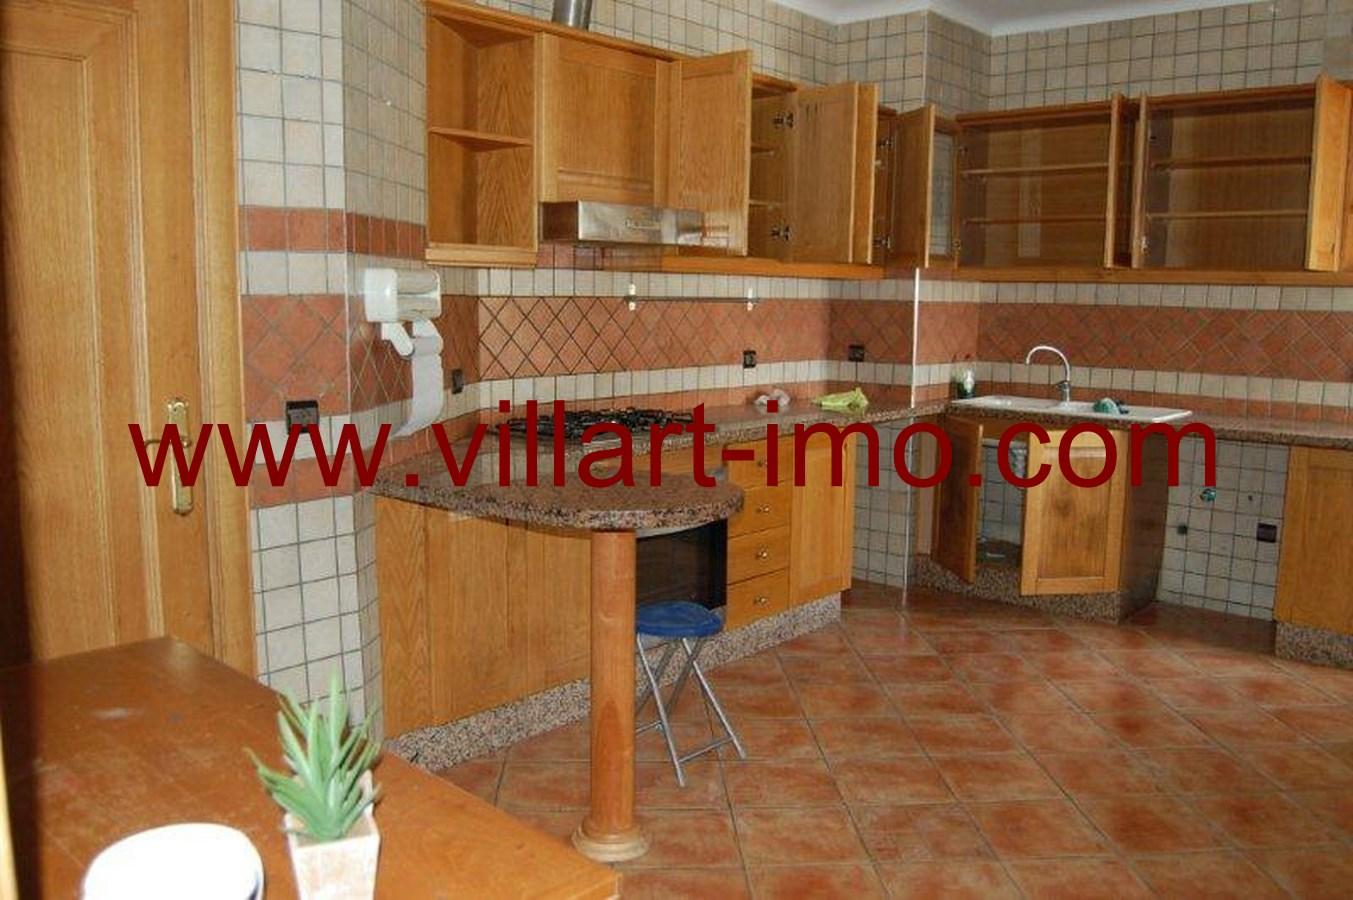 4-Location-Appartement-Non meublé-Tanger-Iberia-Cuisine-L484-Villart immo